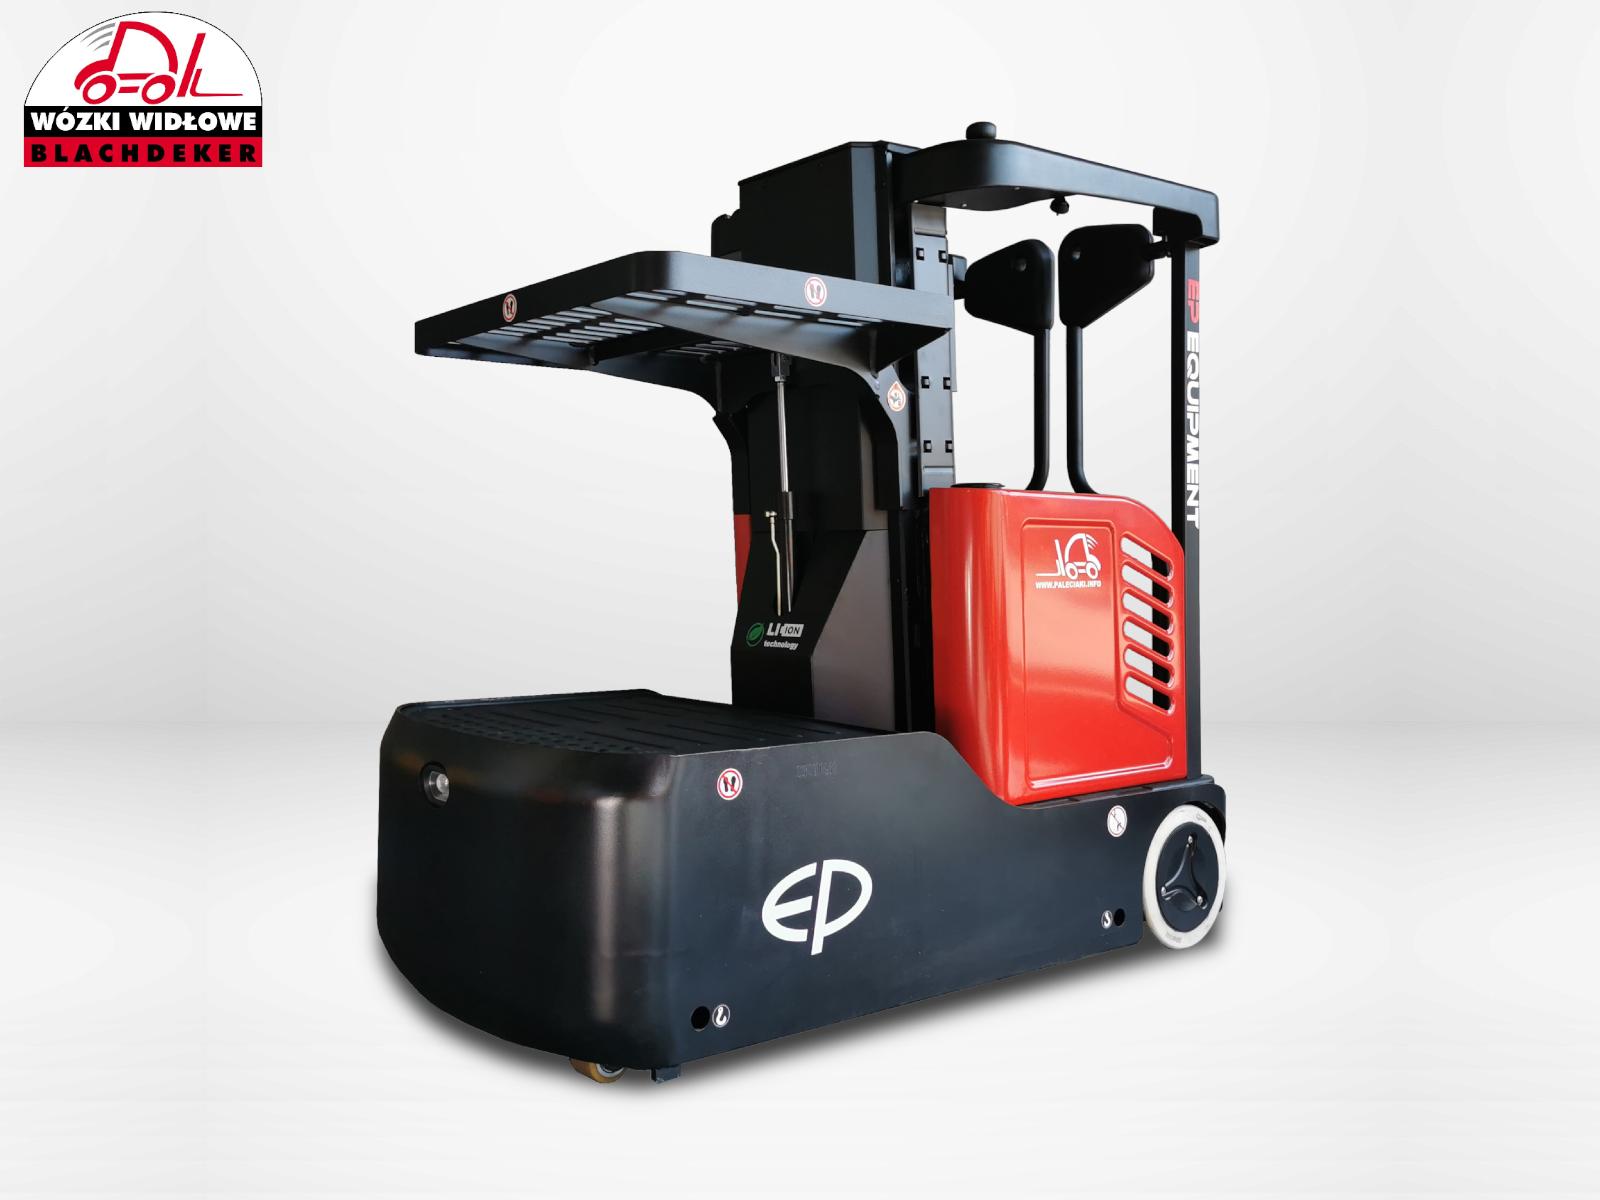 Electric order picker EP JX0 Li-ion battery